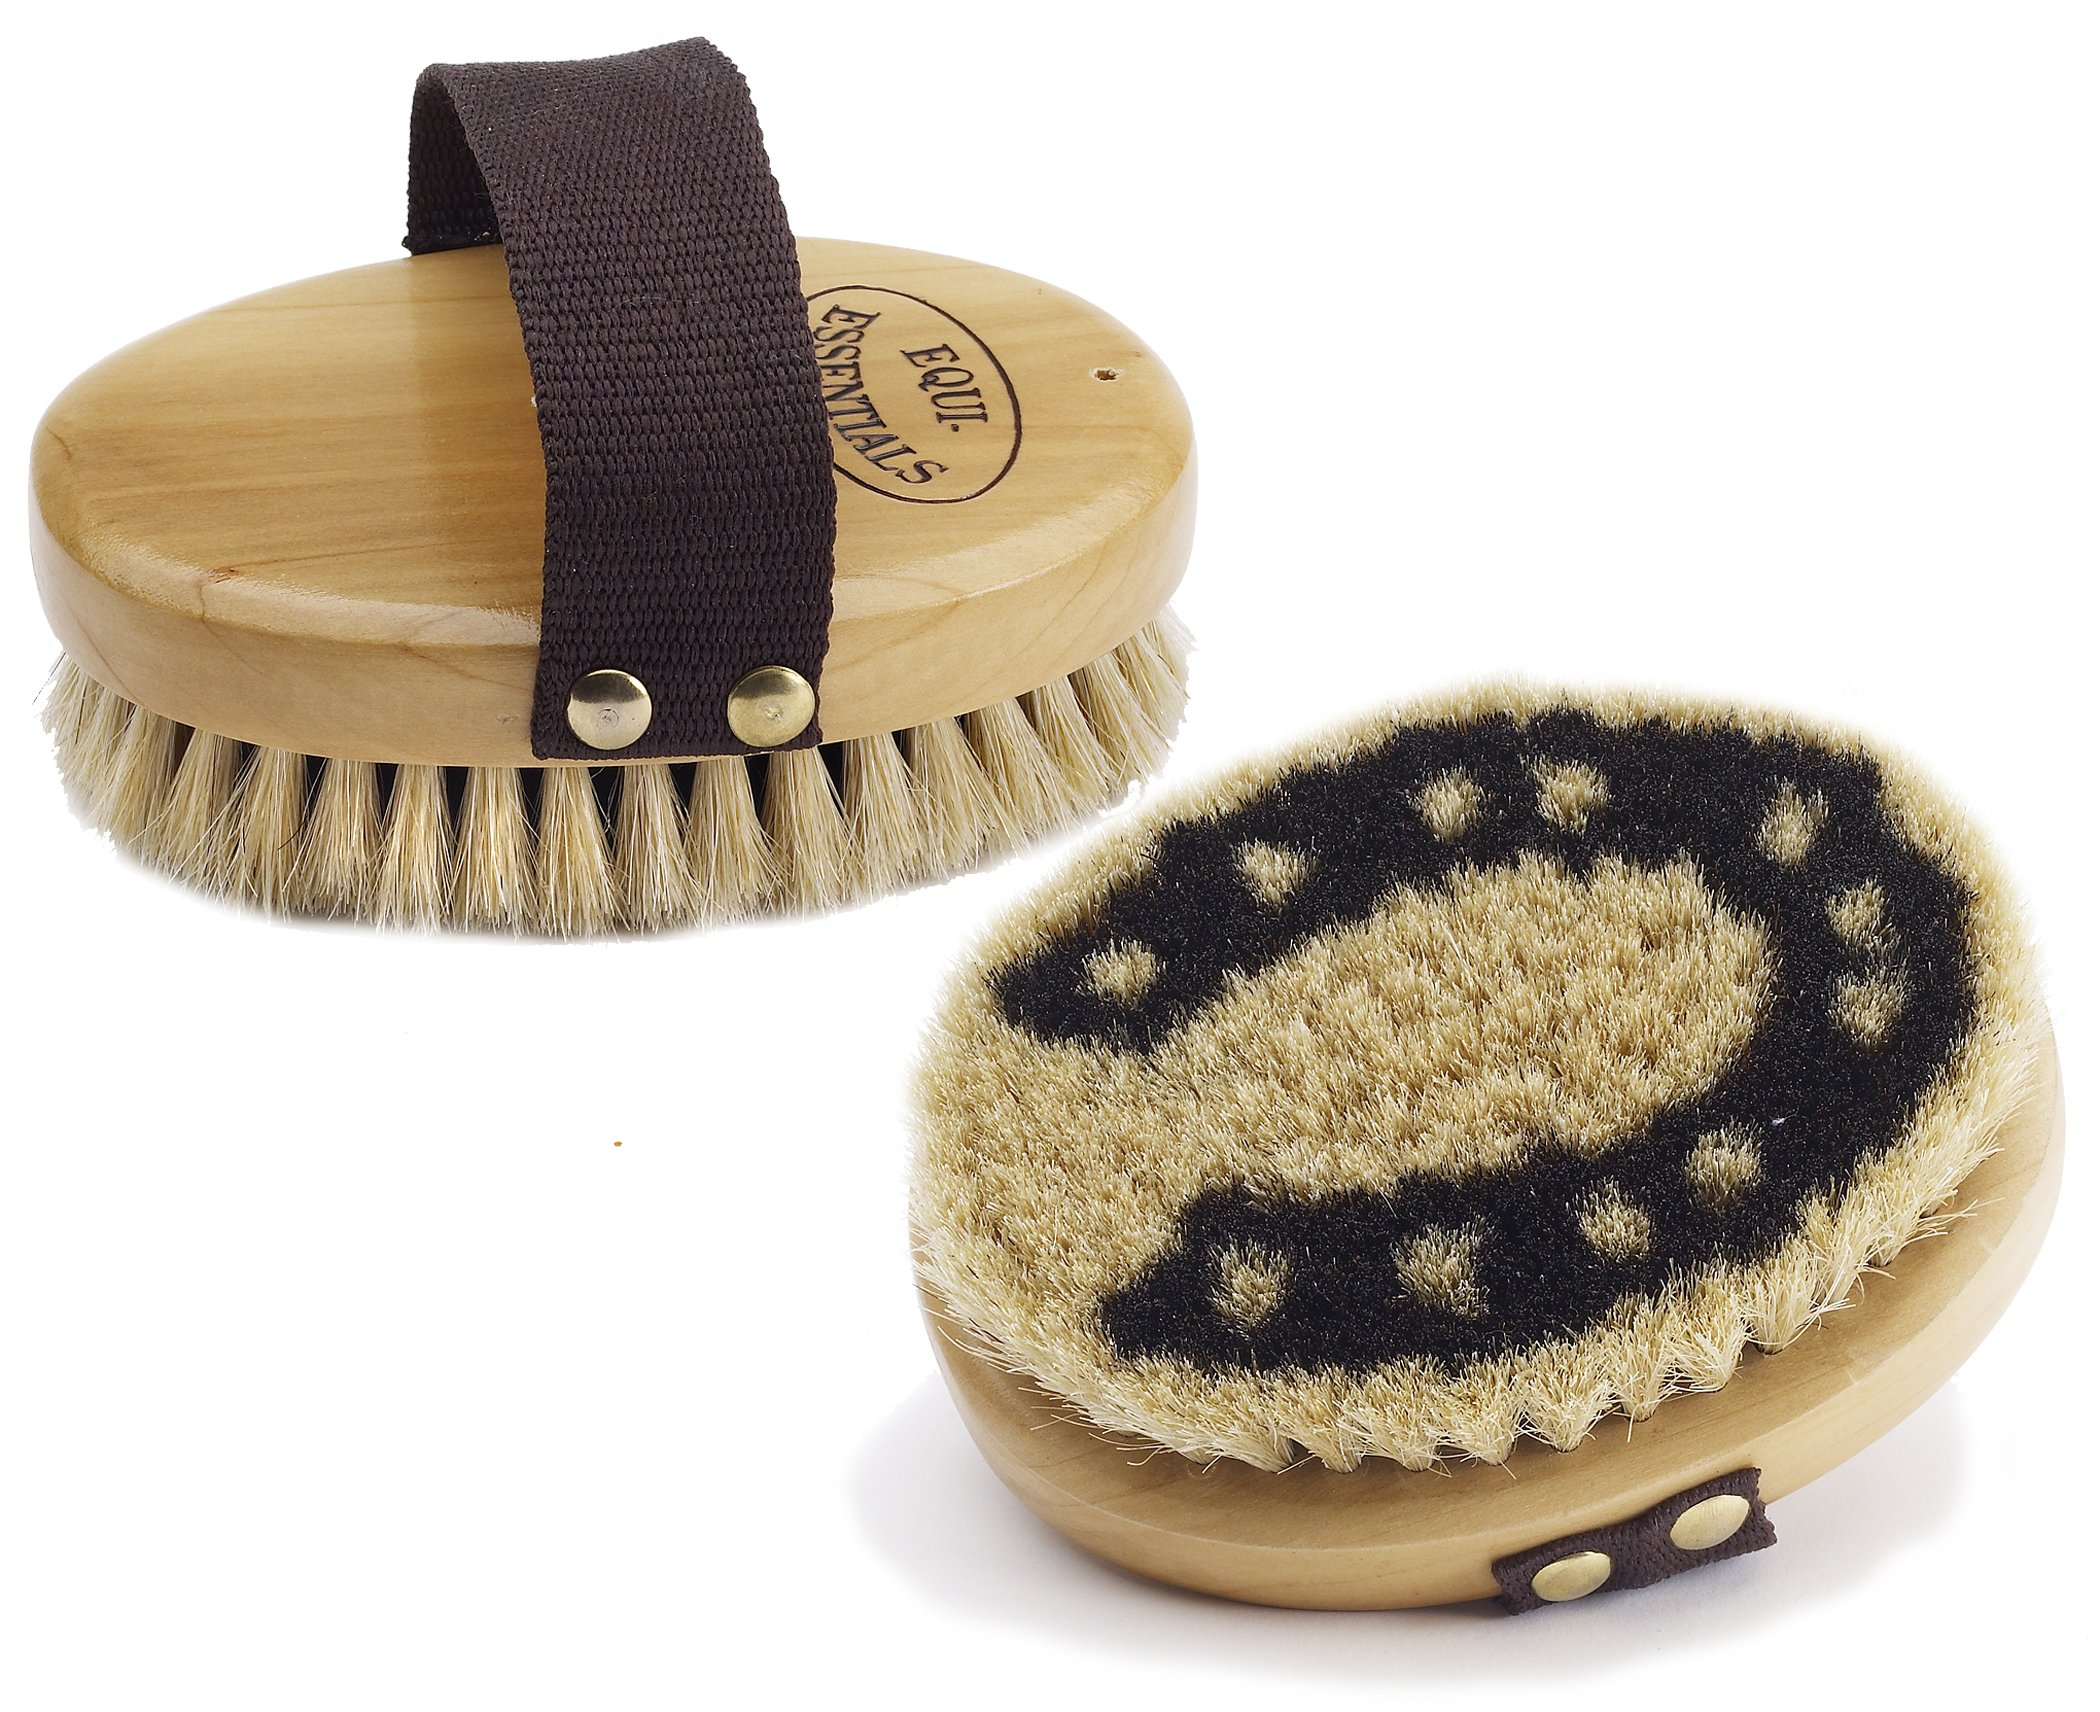 Equi-Essentials  Wood Backed Horsehoe Horsehair Body Brush